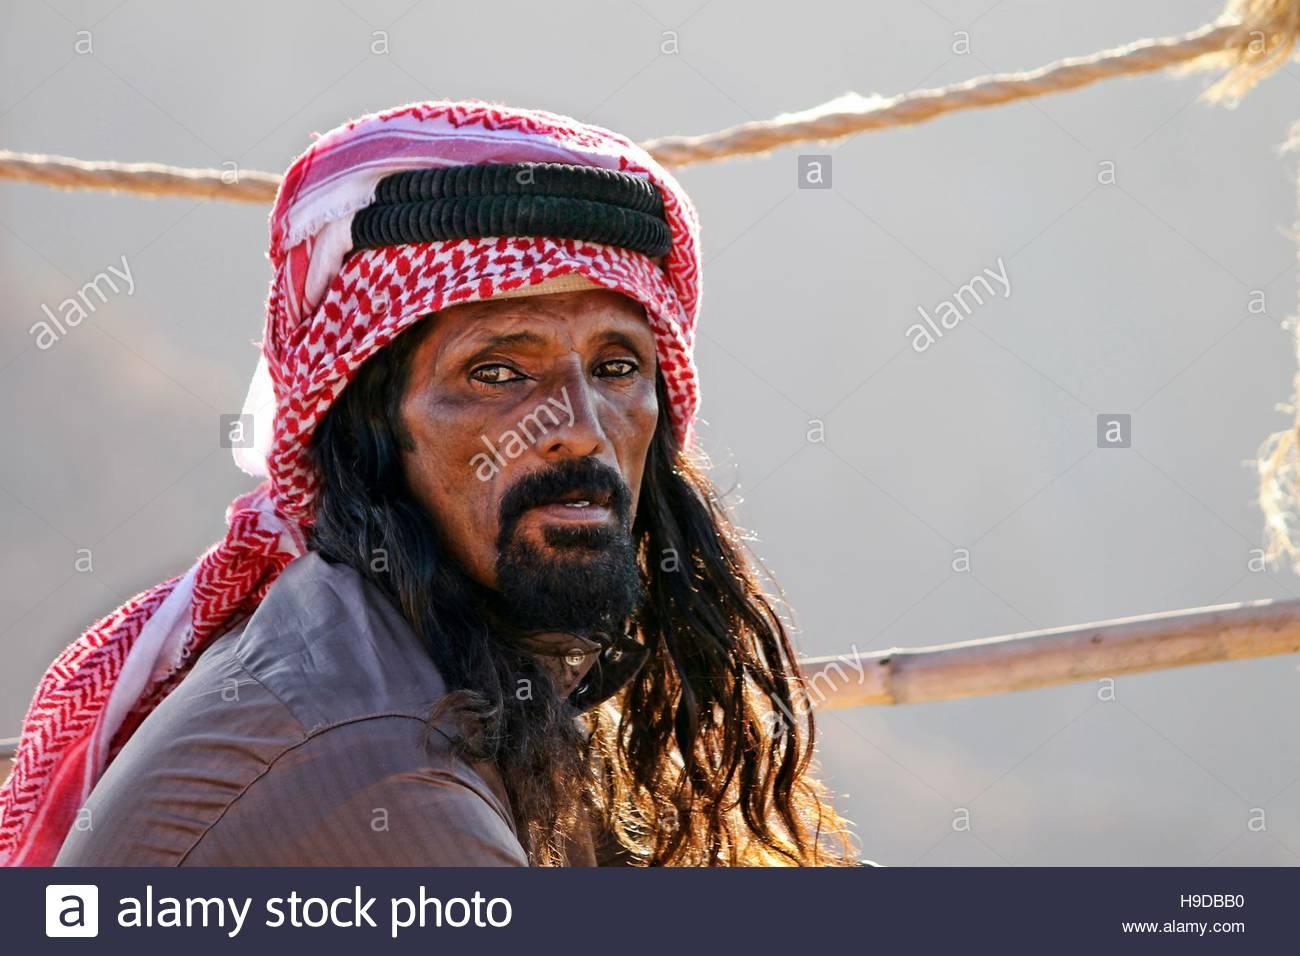 an old jordan beduin catched during a tea break, Petra - Stock Image